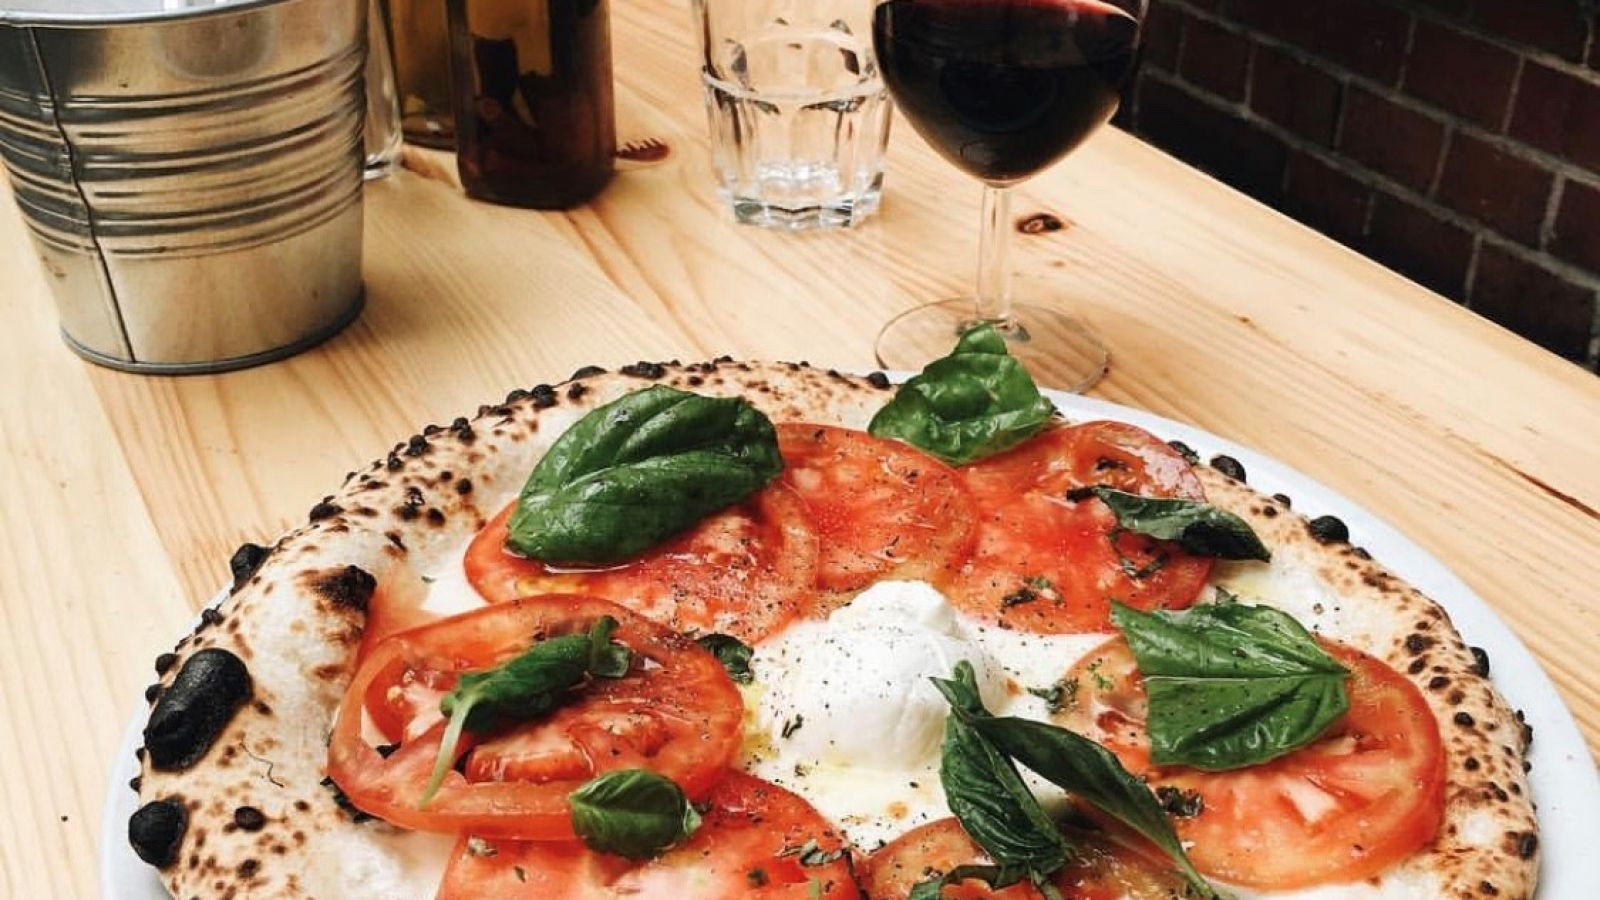 Zola makes authentic Neapolitan pizza in a fire oven. (Photo via Zola's instagram)